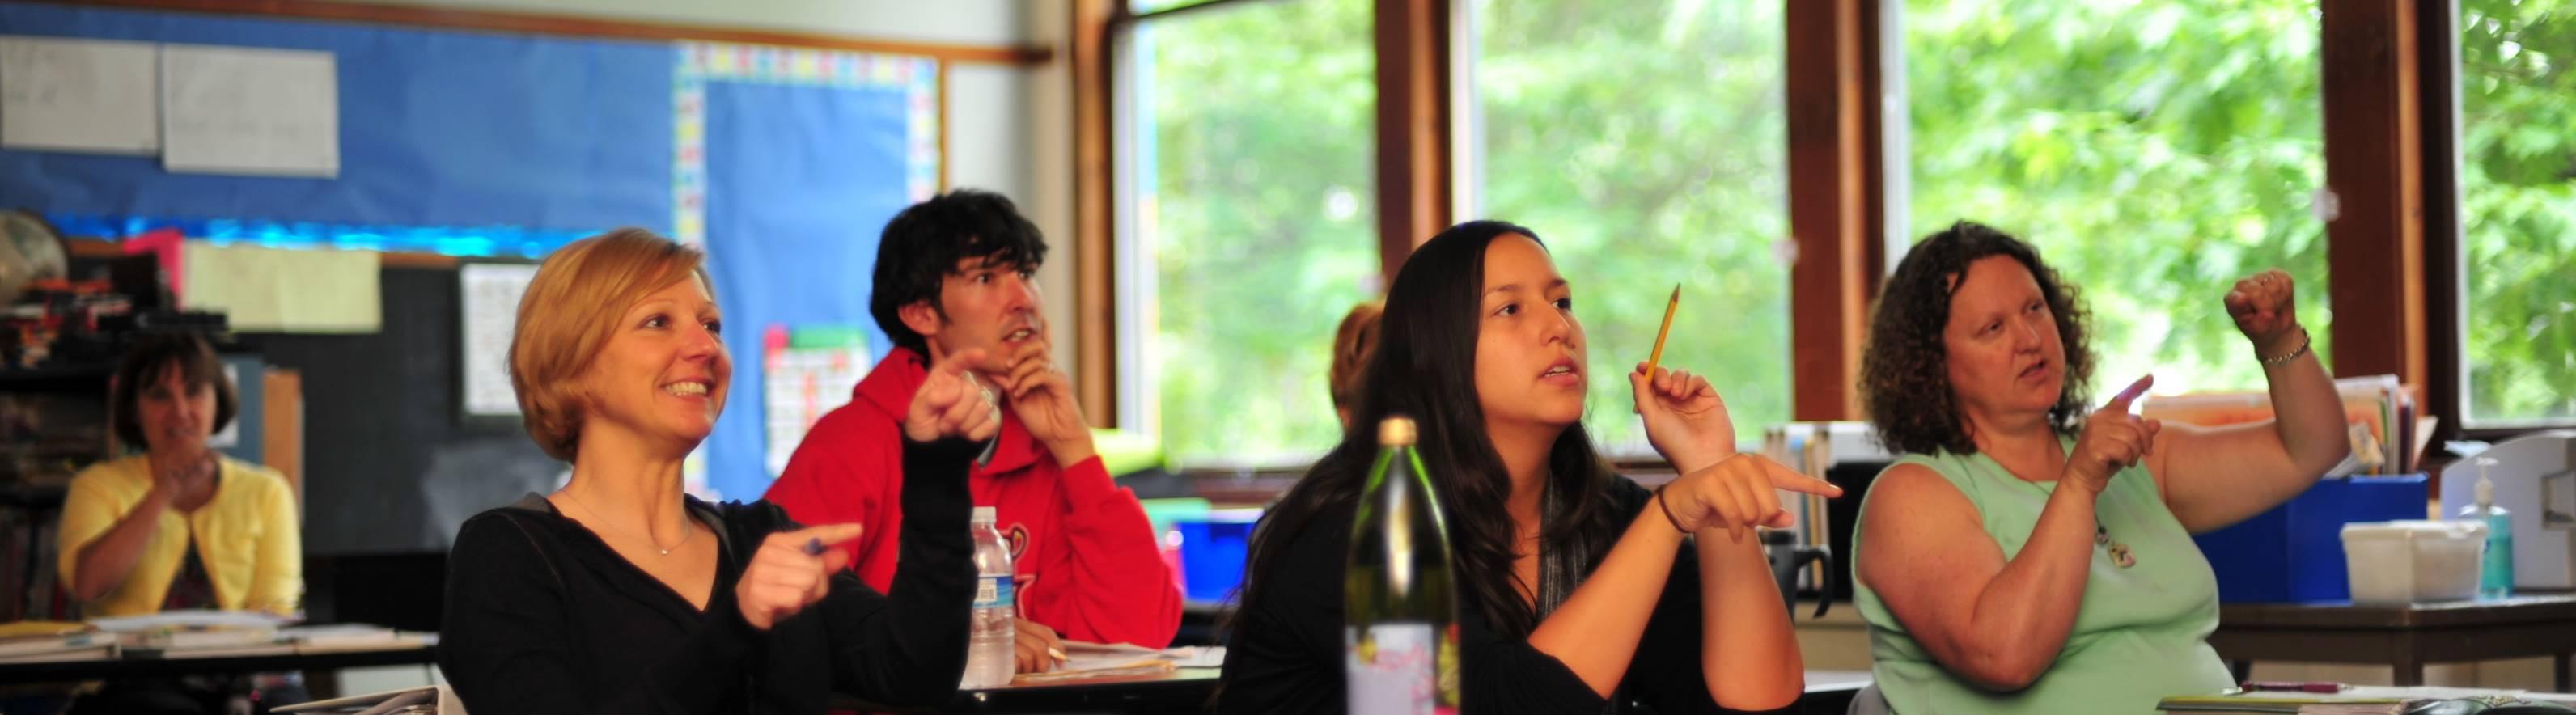 SIL Comprehensive Class - Hamlin Robinson School - Seattle, WA